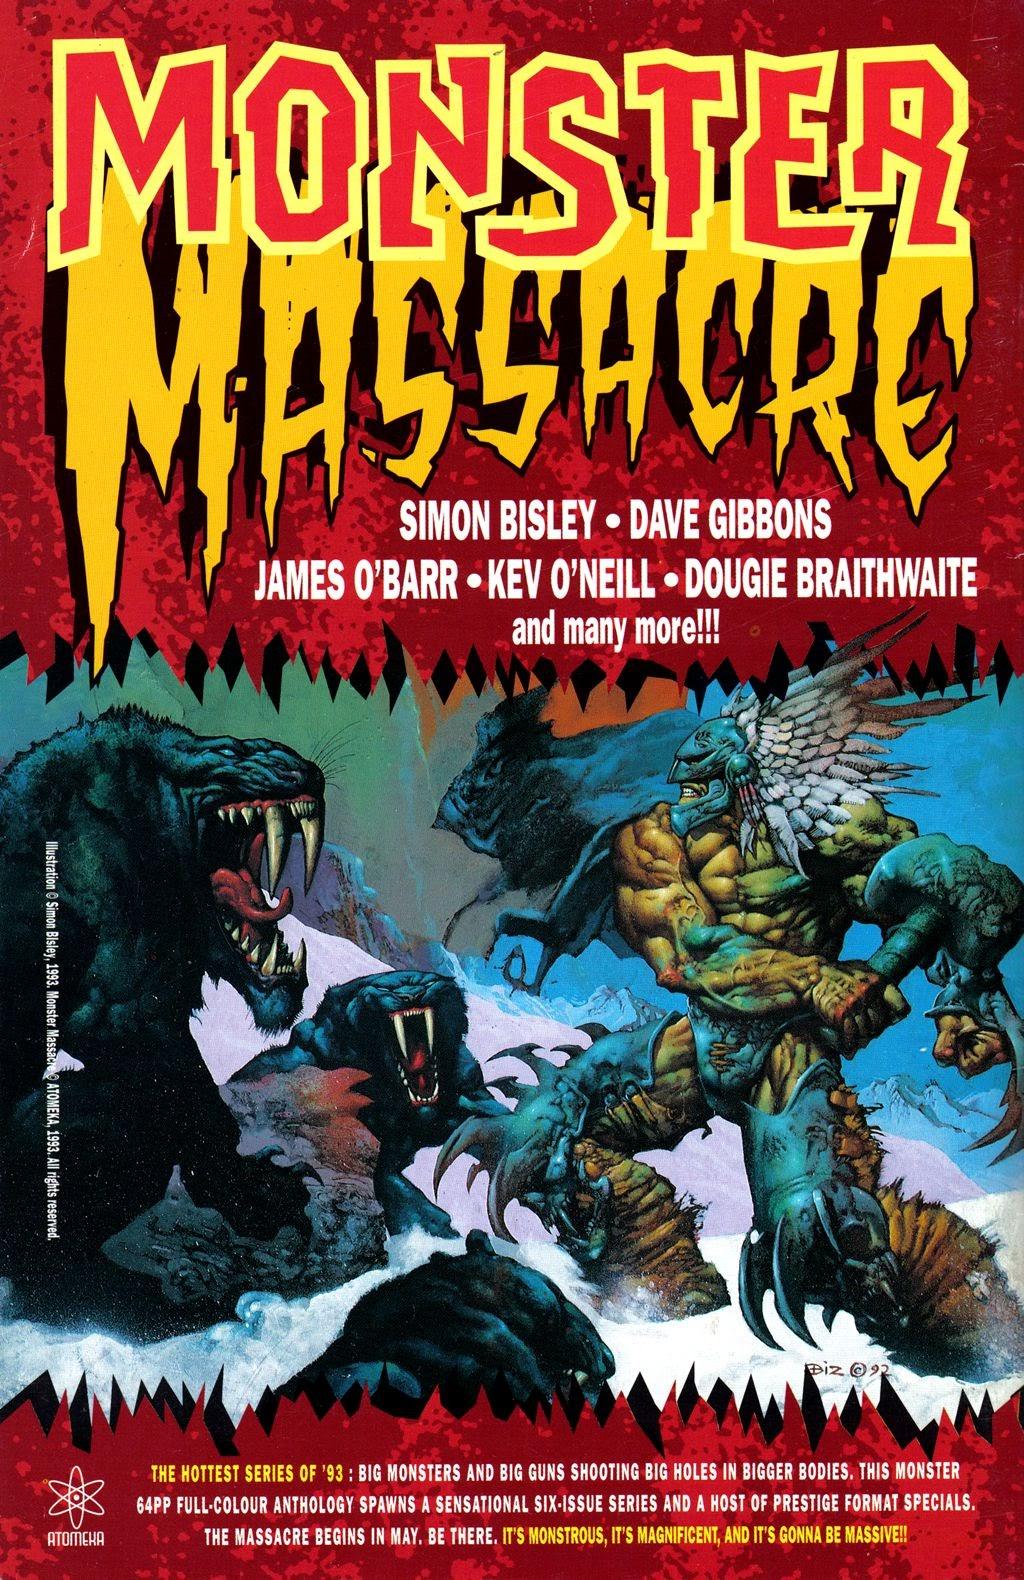 Read online Bisley's Scrapbook comic -  Issue # Full - 36